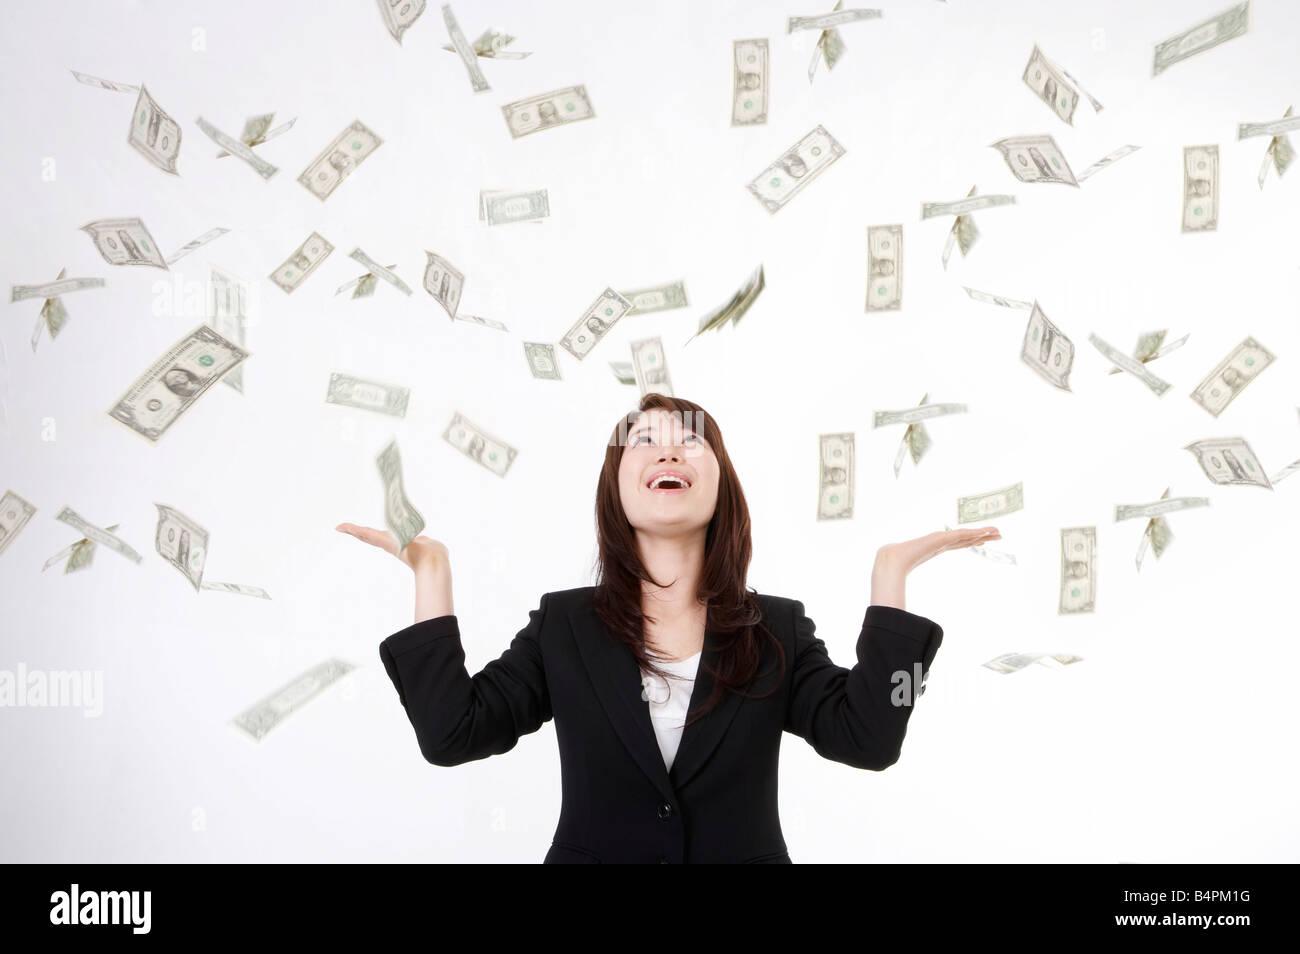 Money Raining Down On Woman Stock Photos Money Raining Down On